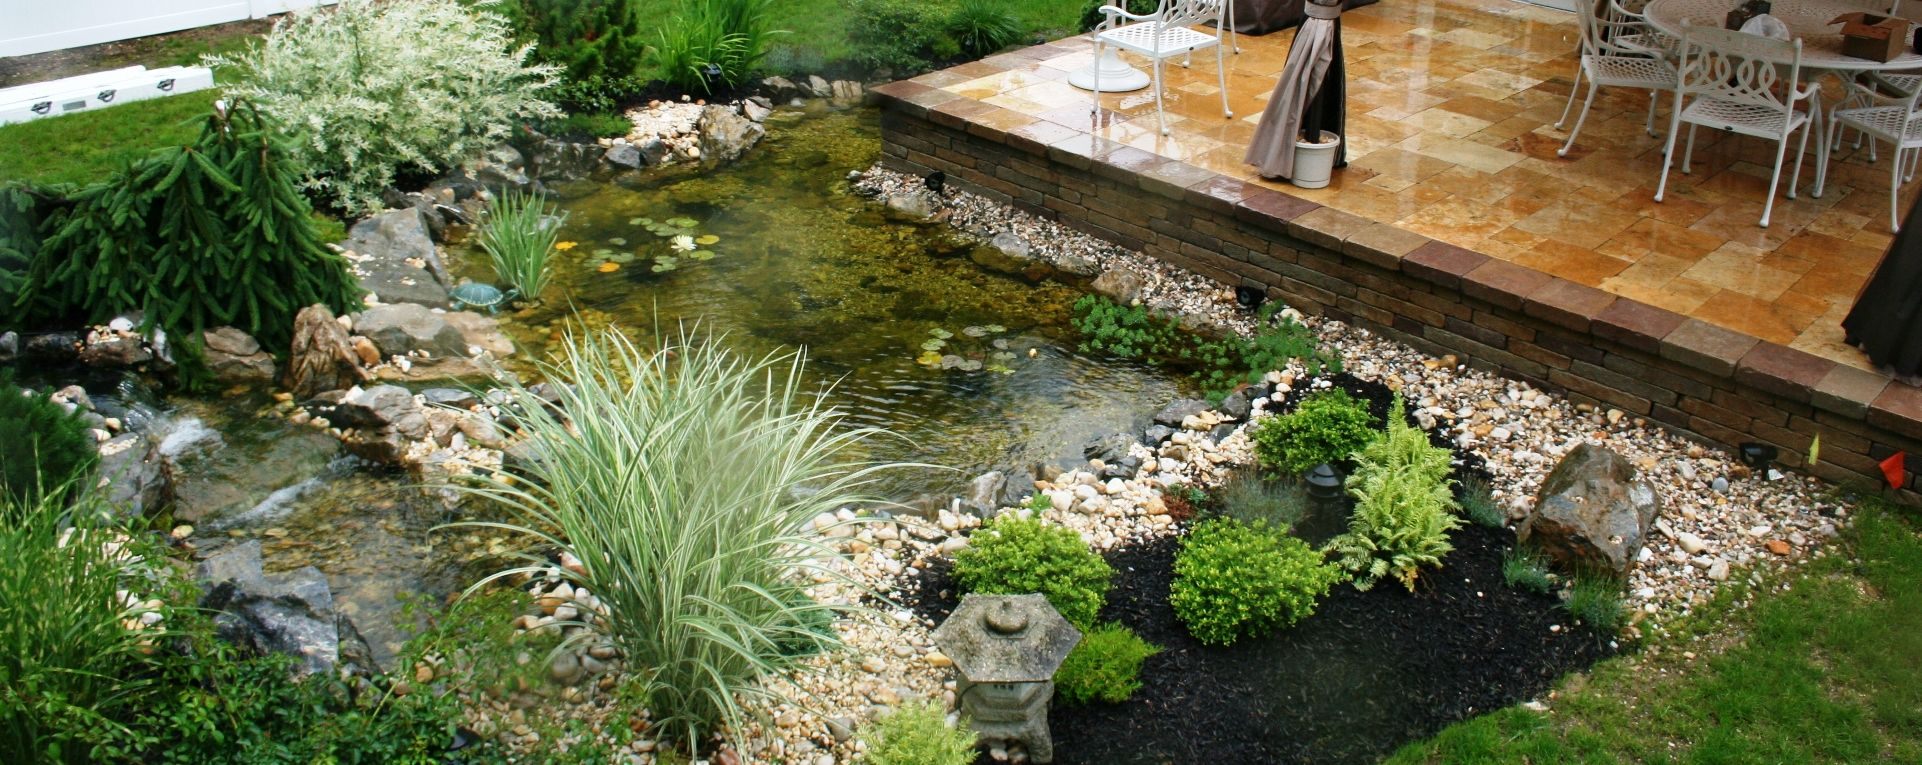 Image Result For Deck With Pond Designs Pond Design Koi 400 x 300